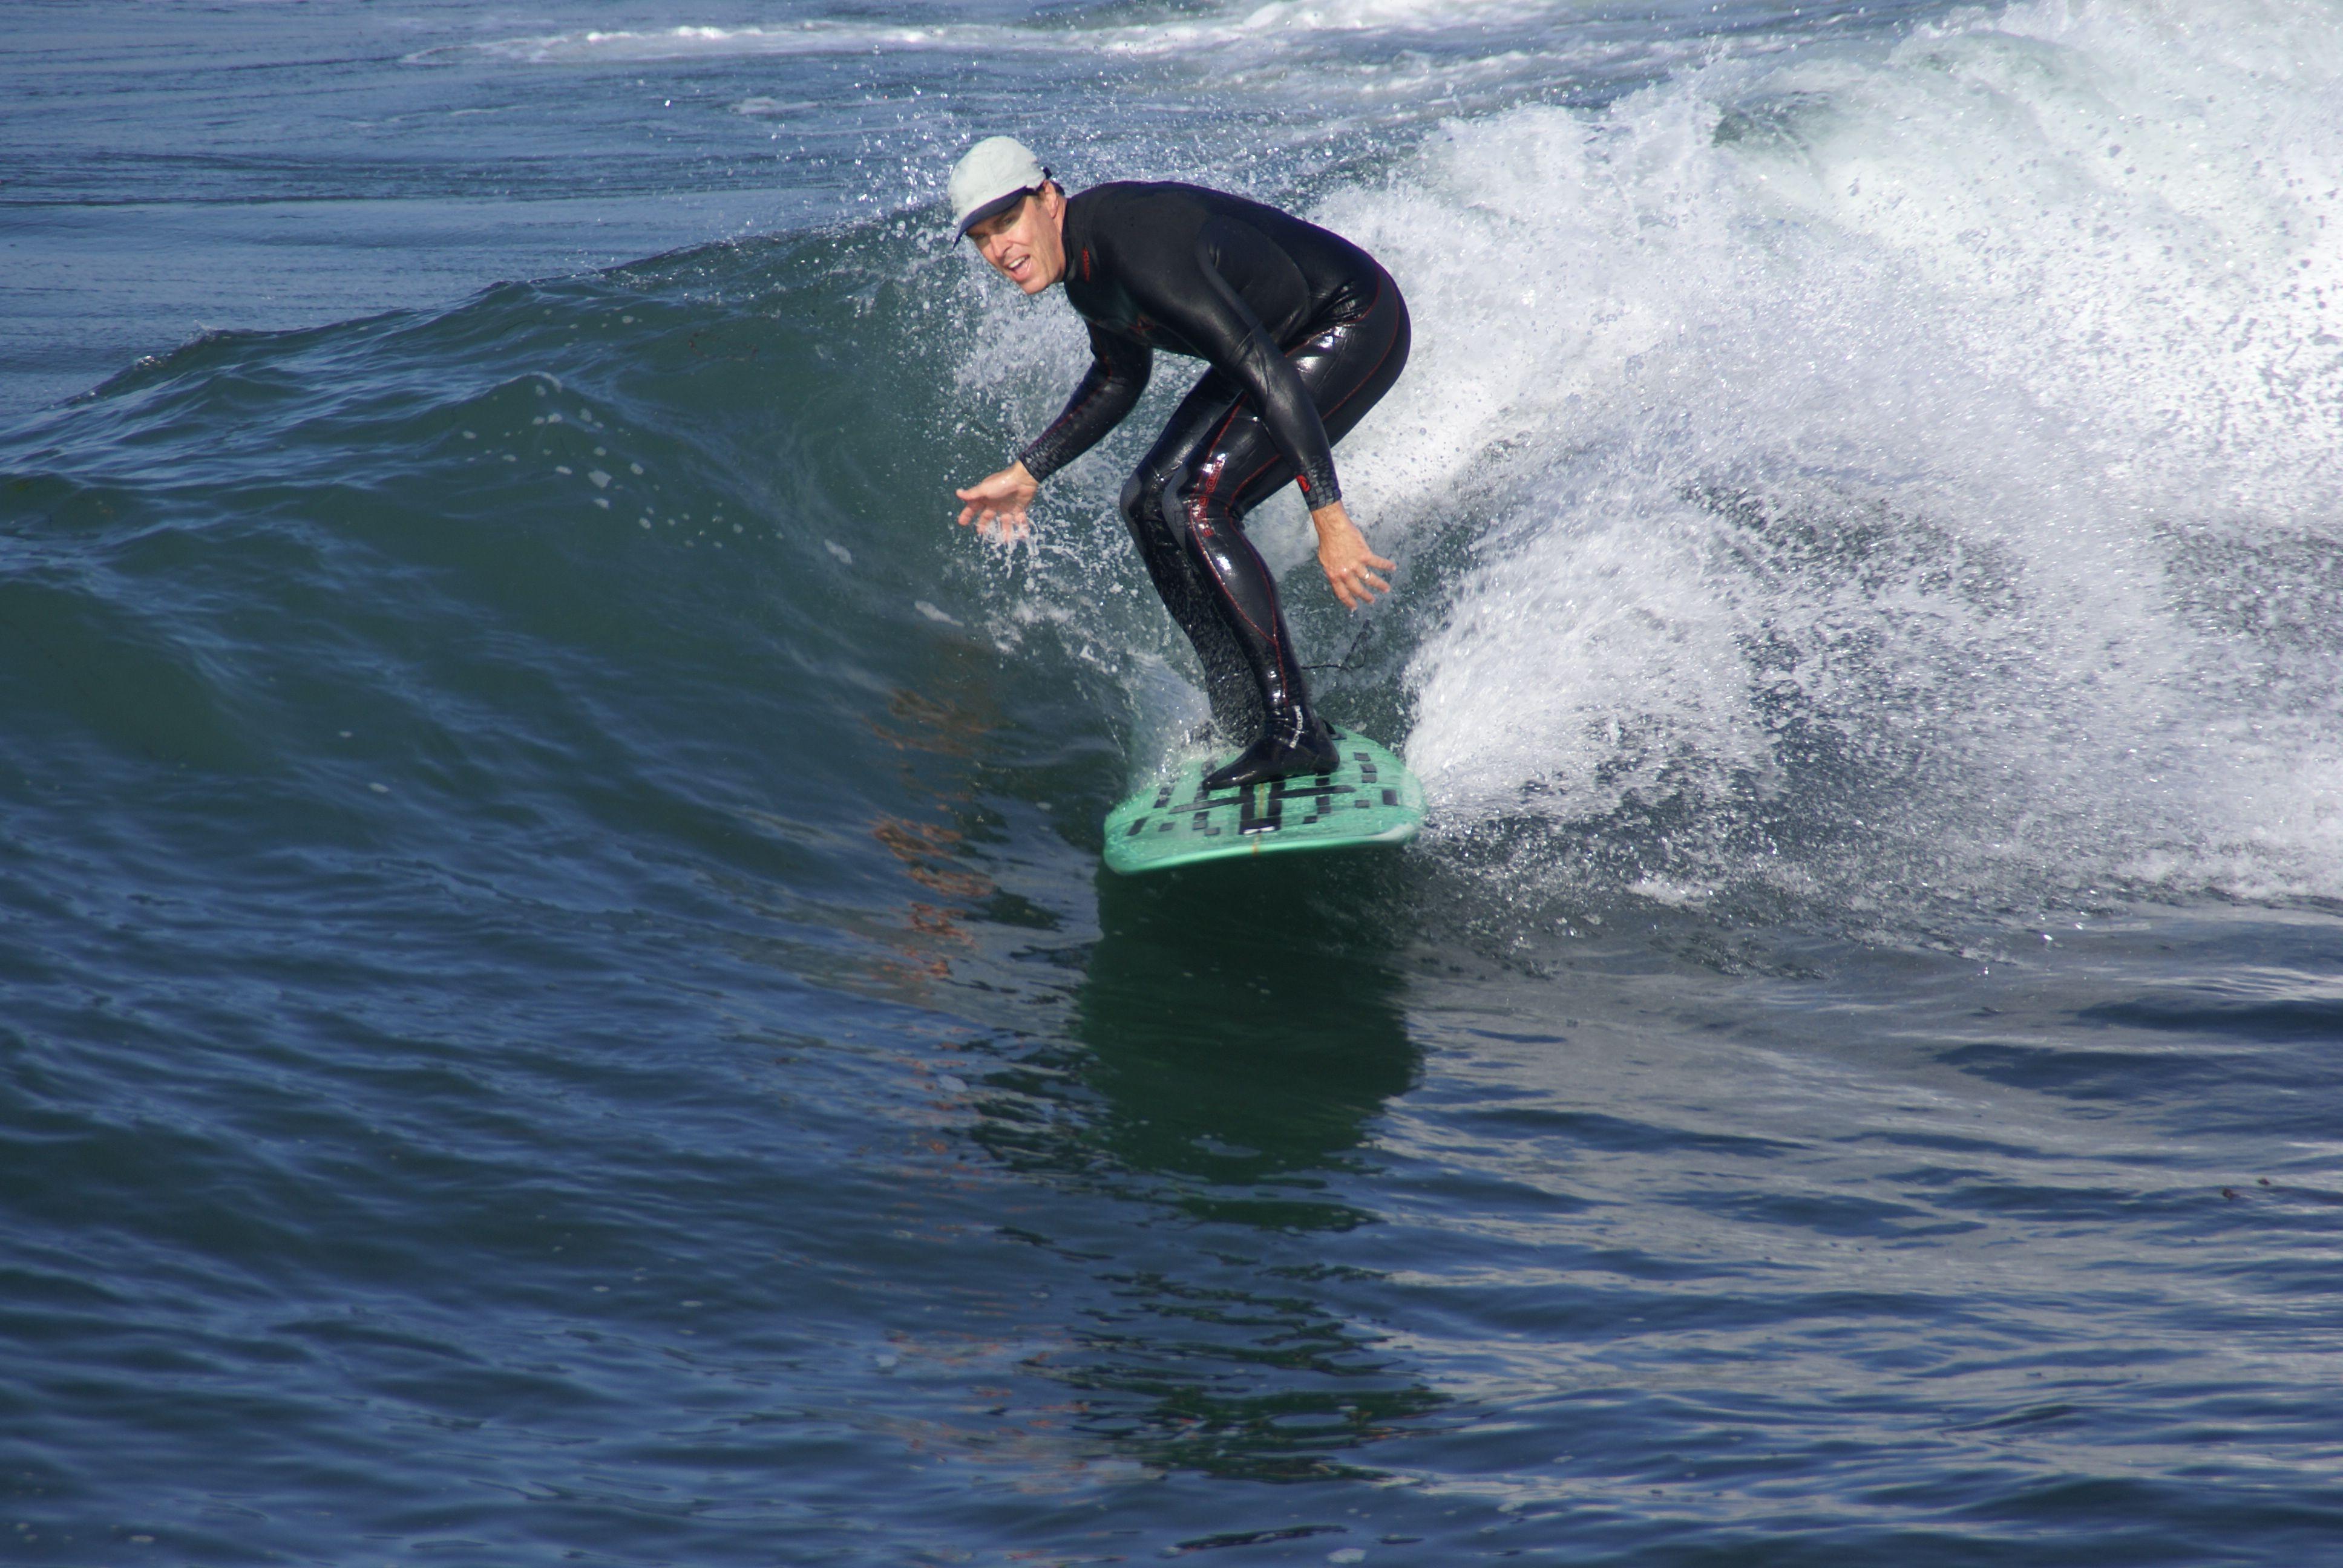 Las Gaviotas Surf Rosarito Beach Baja California Rosarito